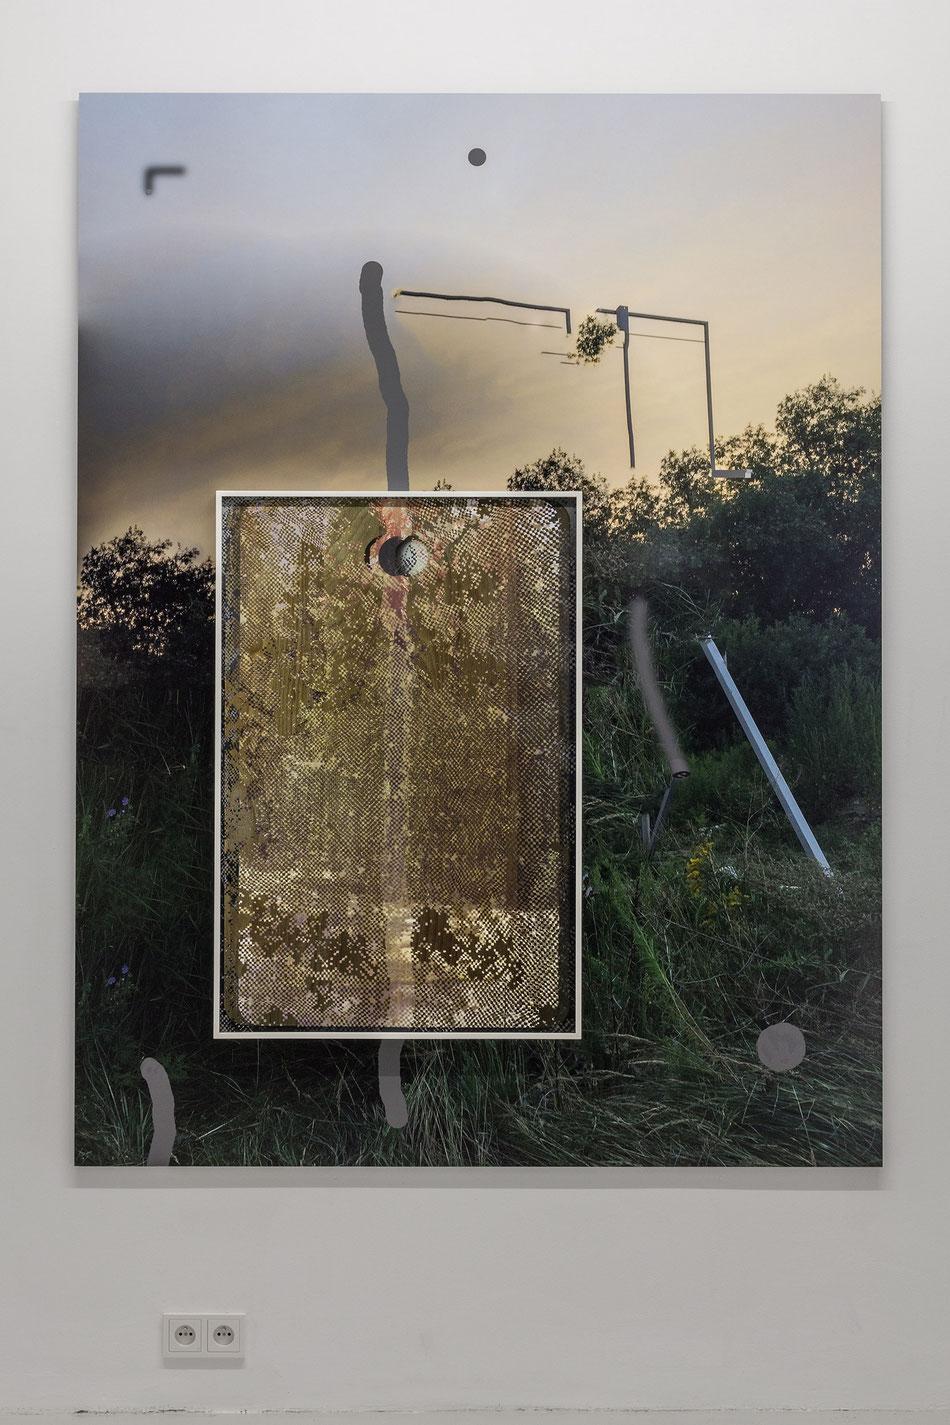 Reflex Wander #06, 2016, Dibond, Epson on Canson, anti-reflective glass, 150x200 cm + 69x100 cm